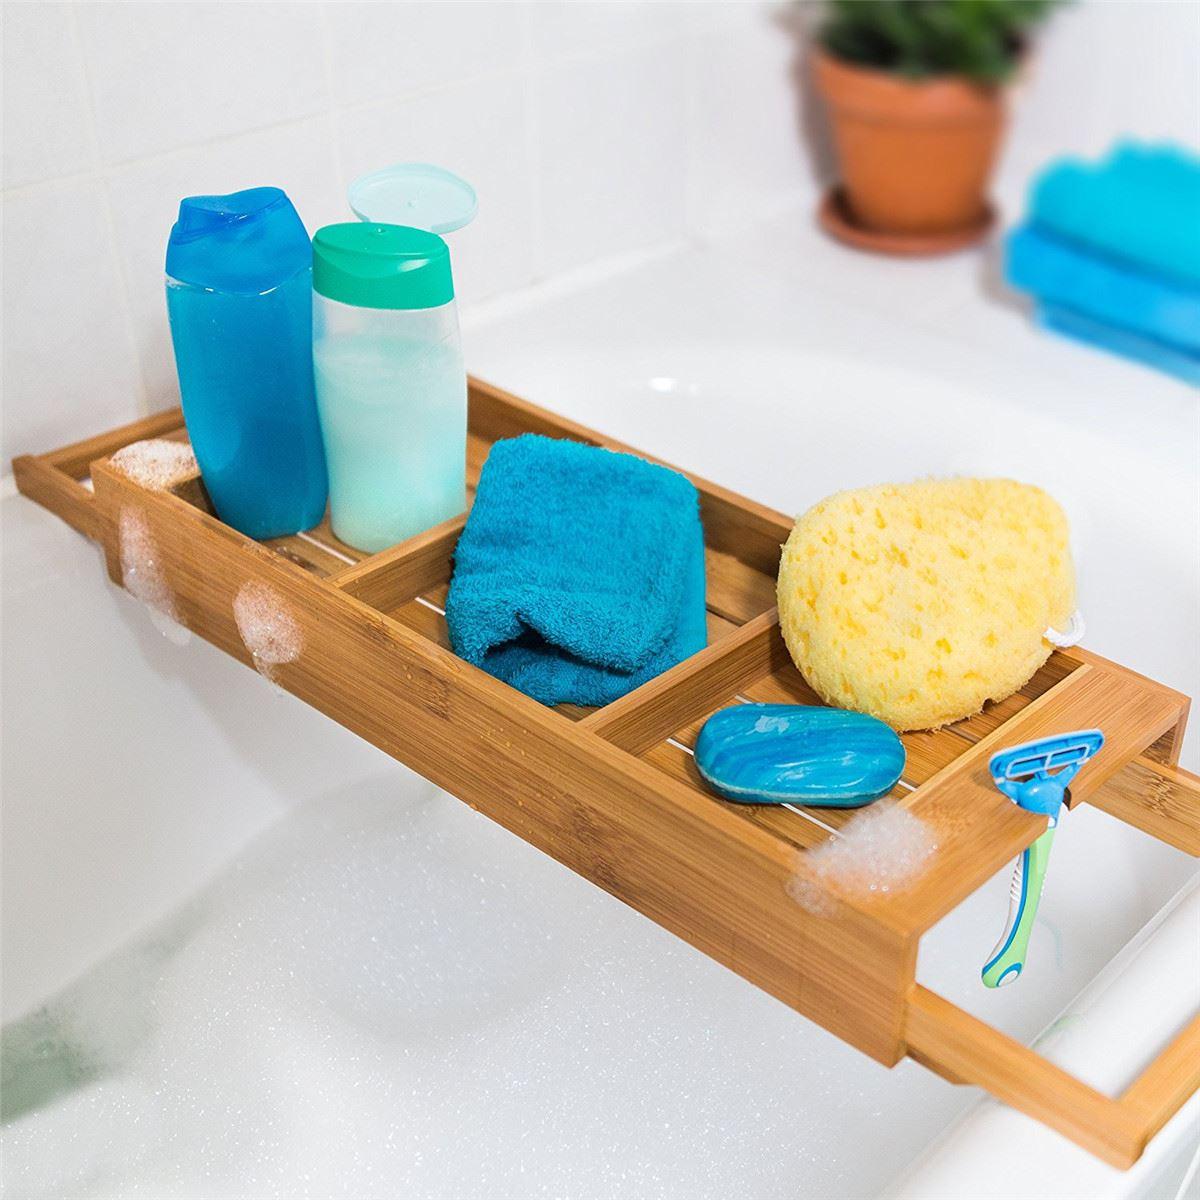 Bathtub Tray Online Buy Wholesale Bathtub Tray From China Bathtub Tray